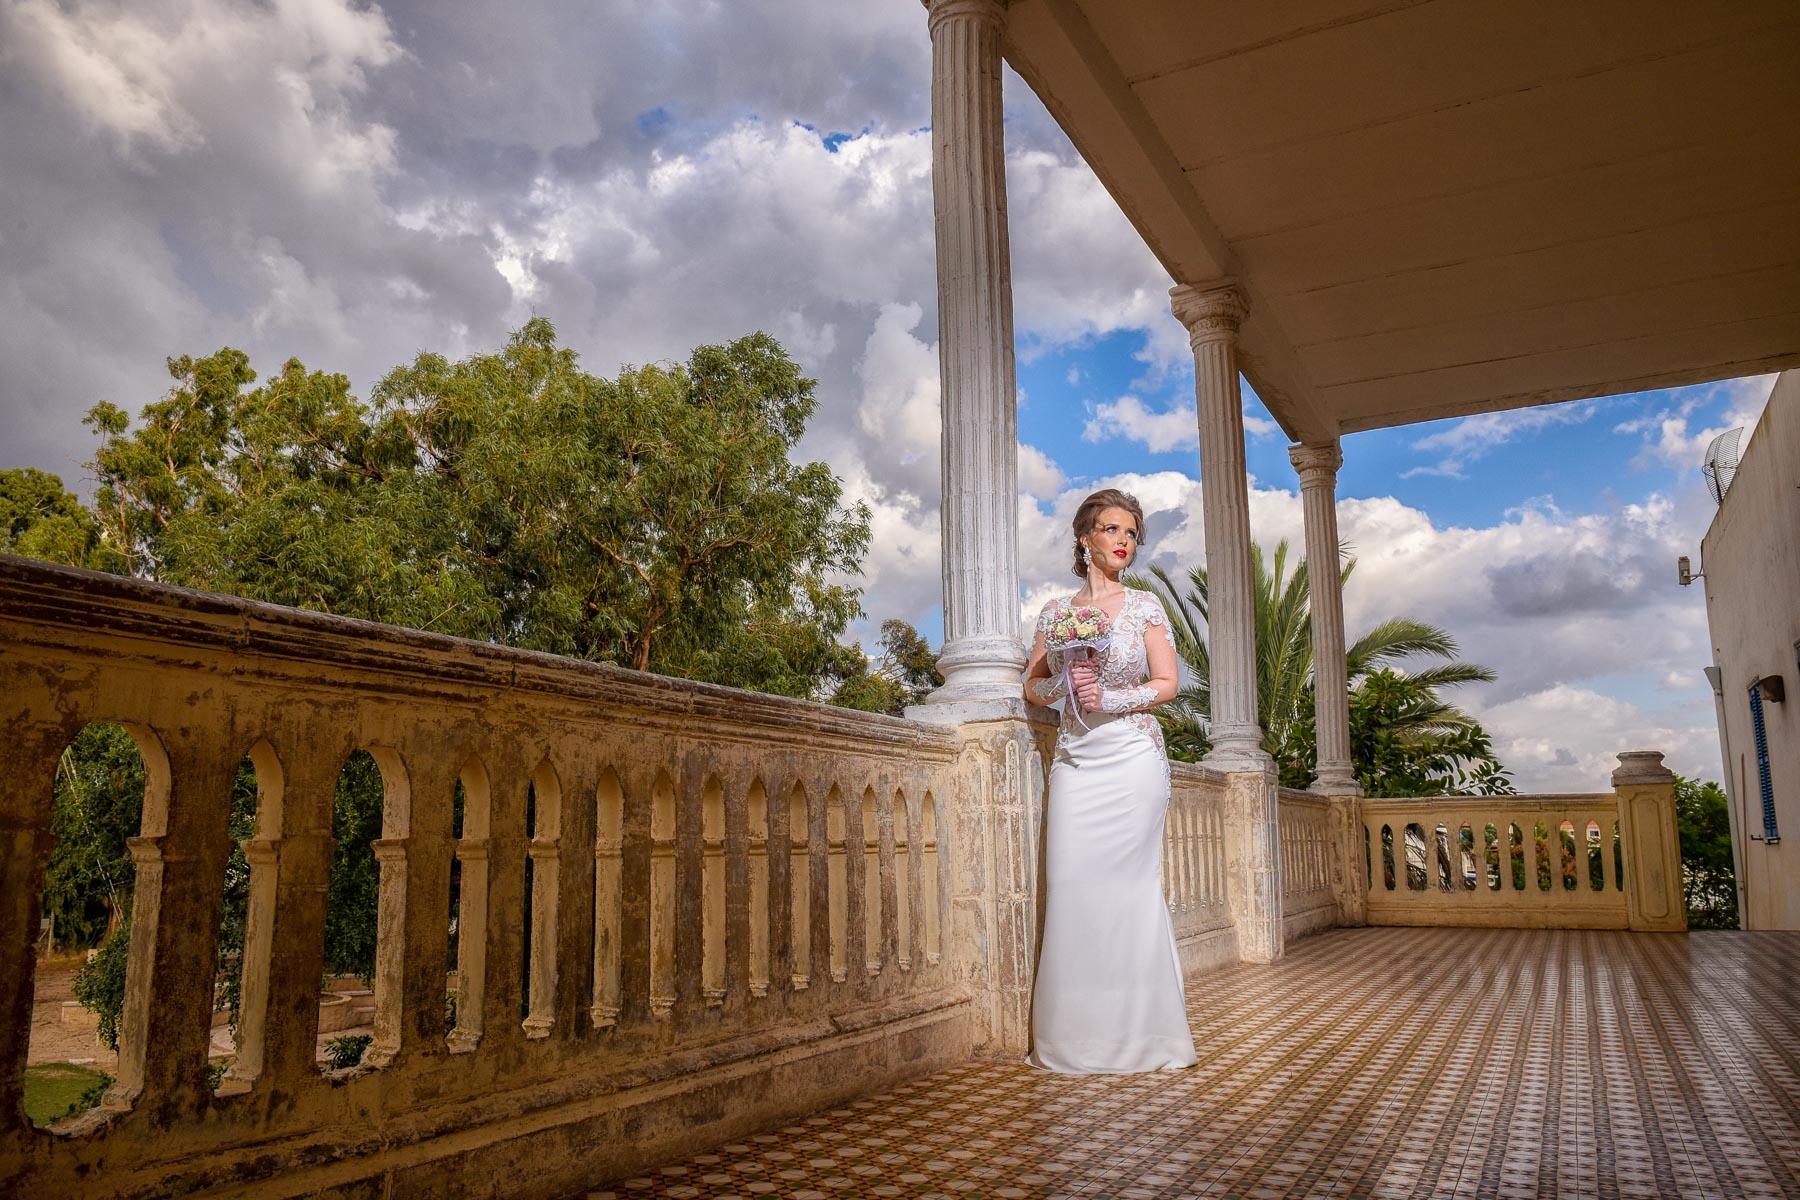 Israeli wedding and event photographer